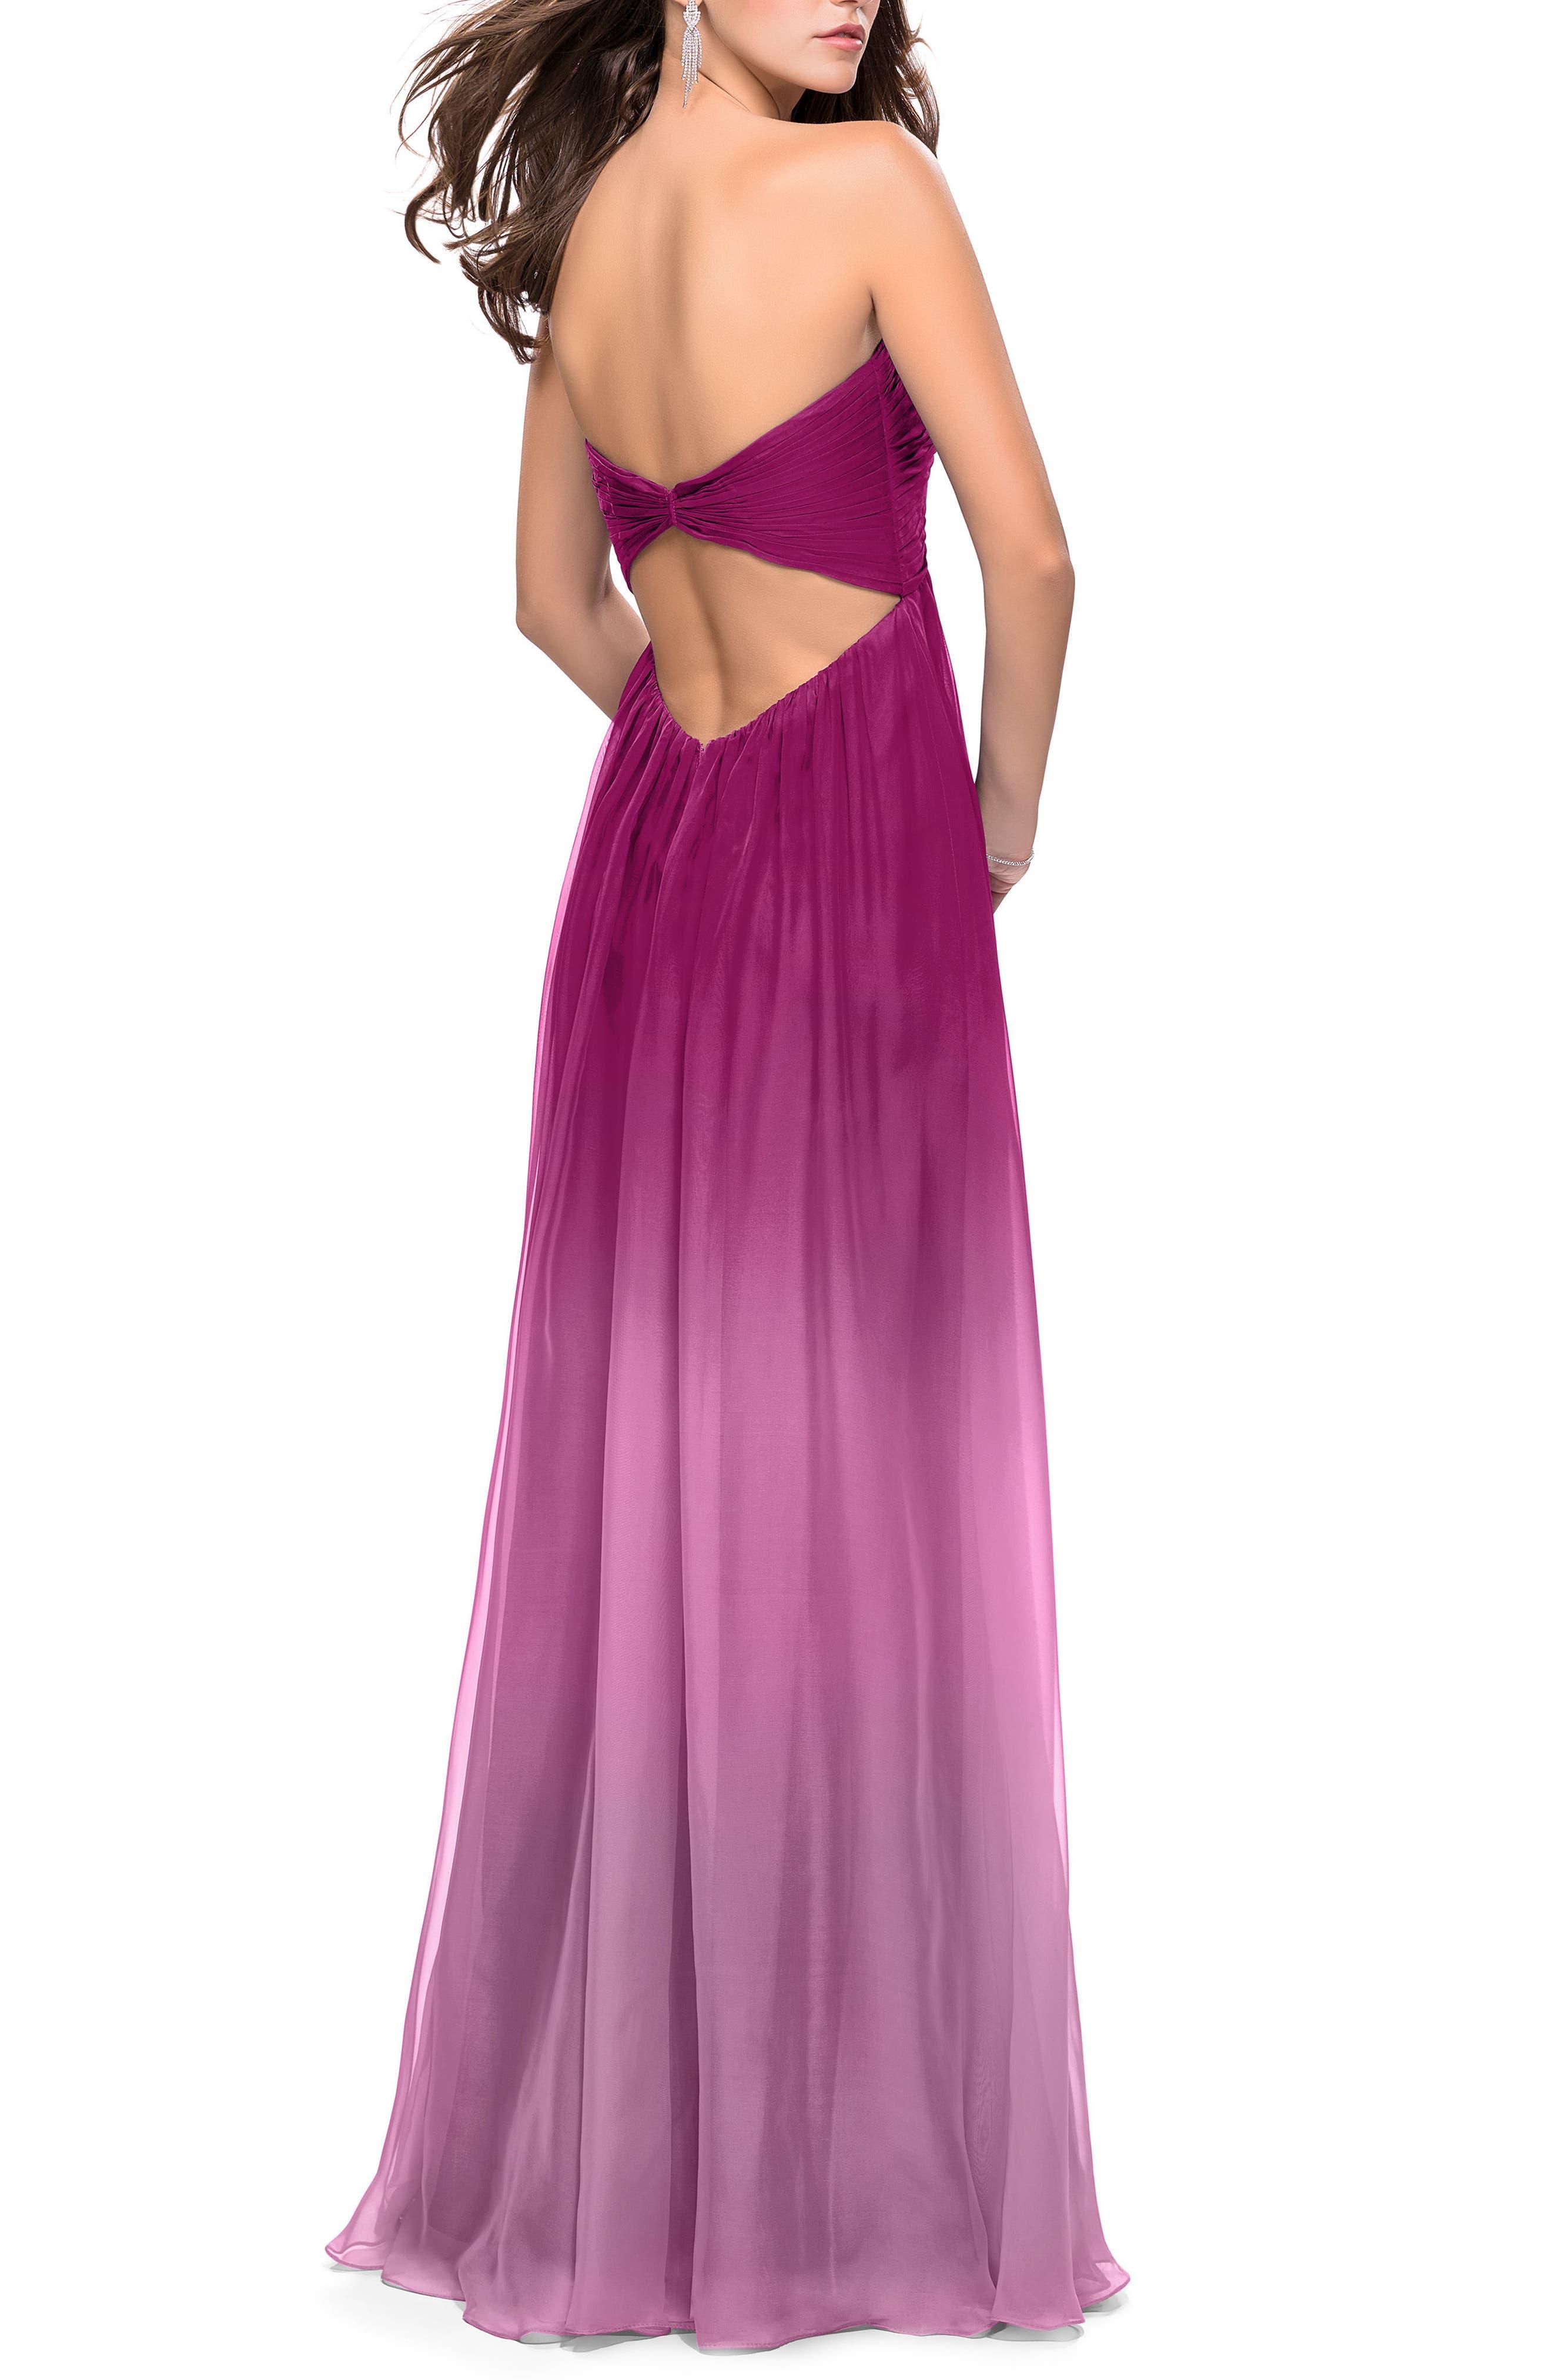 Blue 2018 Prom Dresses | Nordstrom